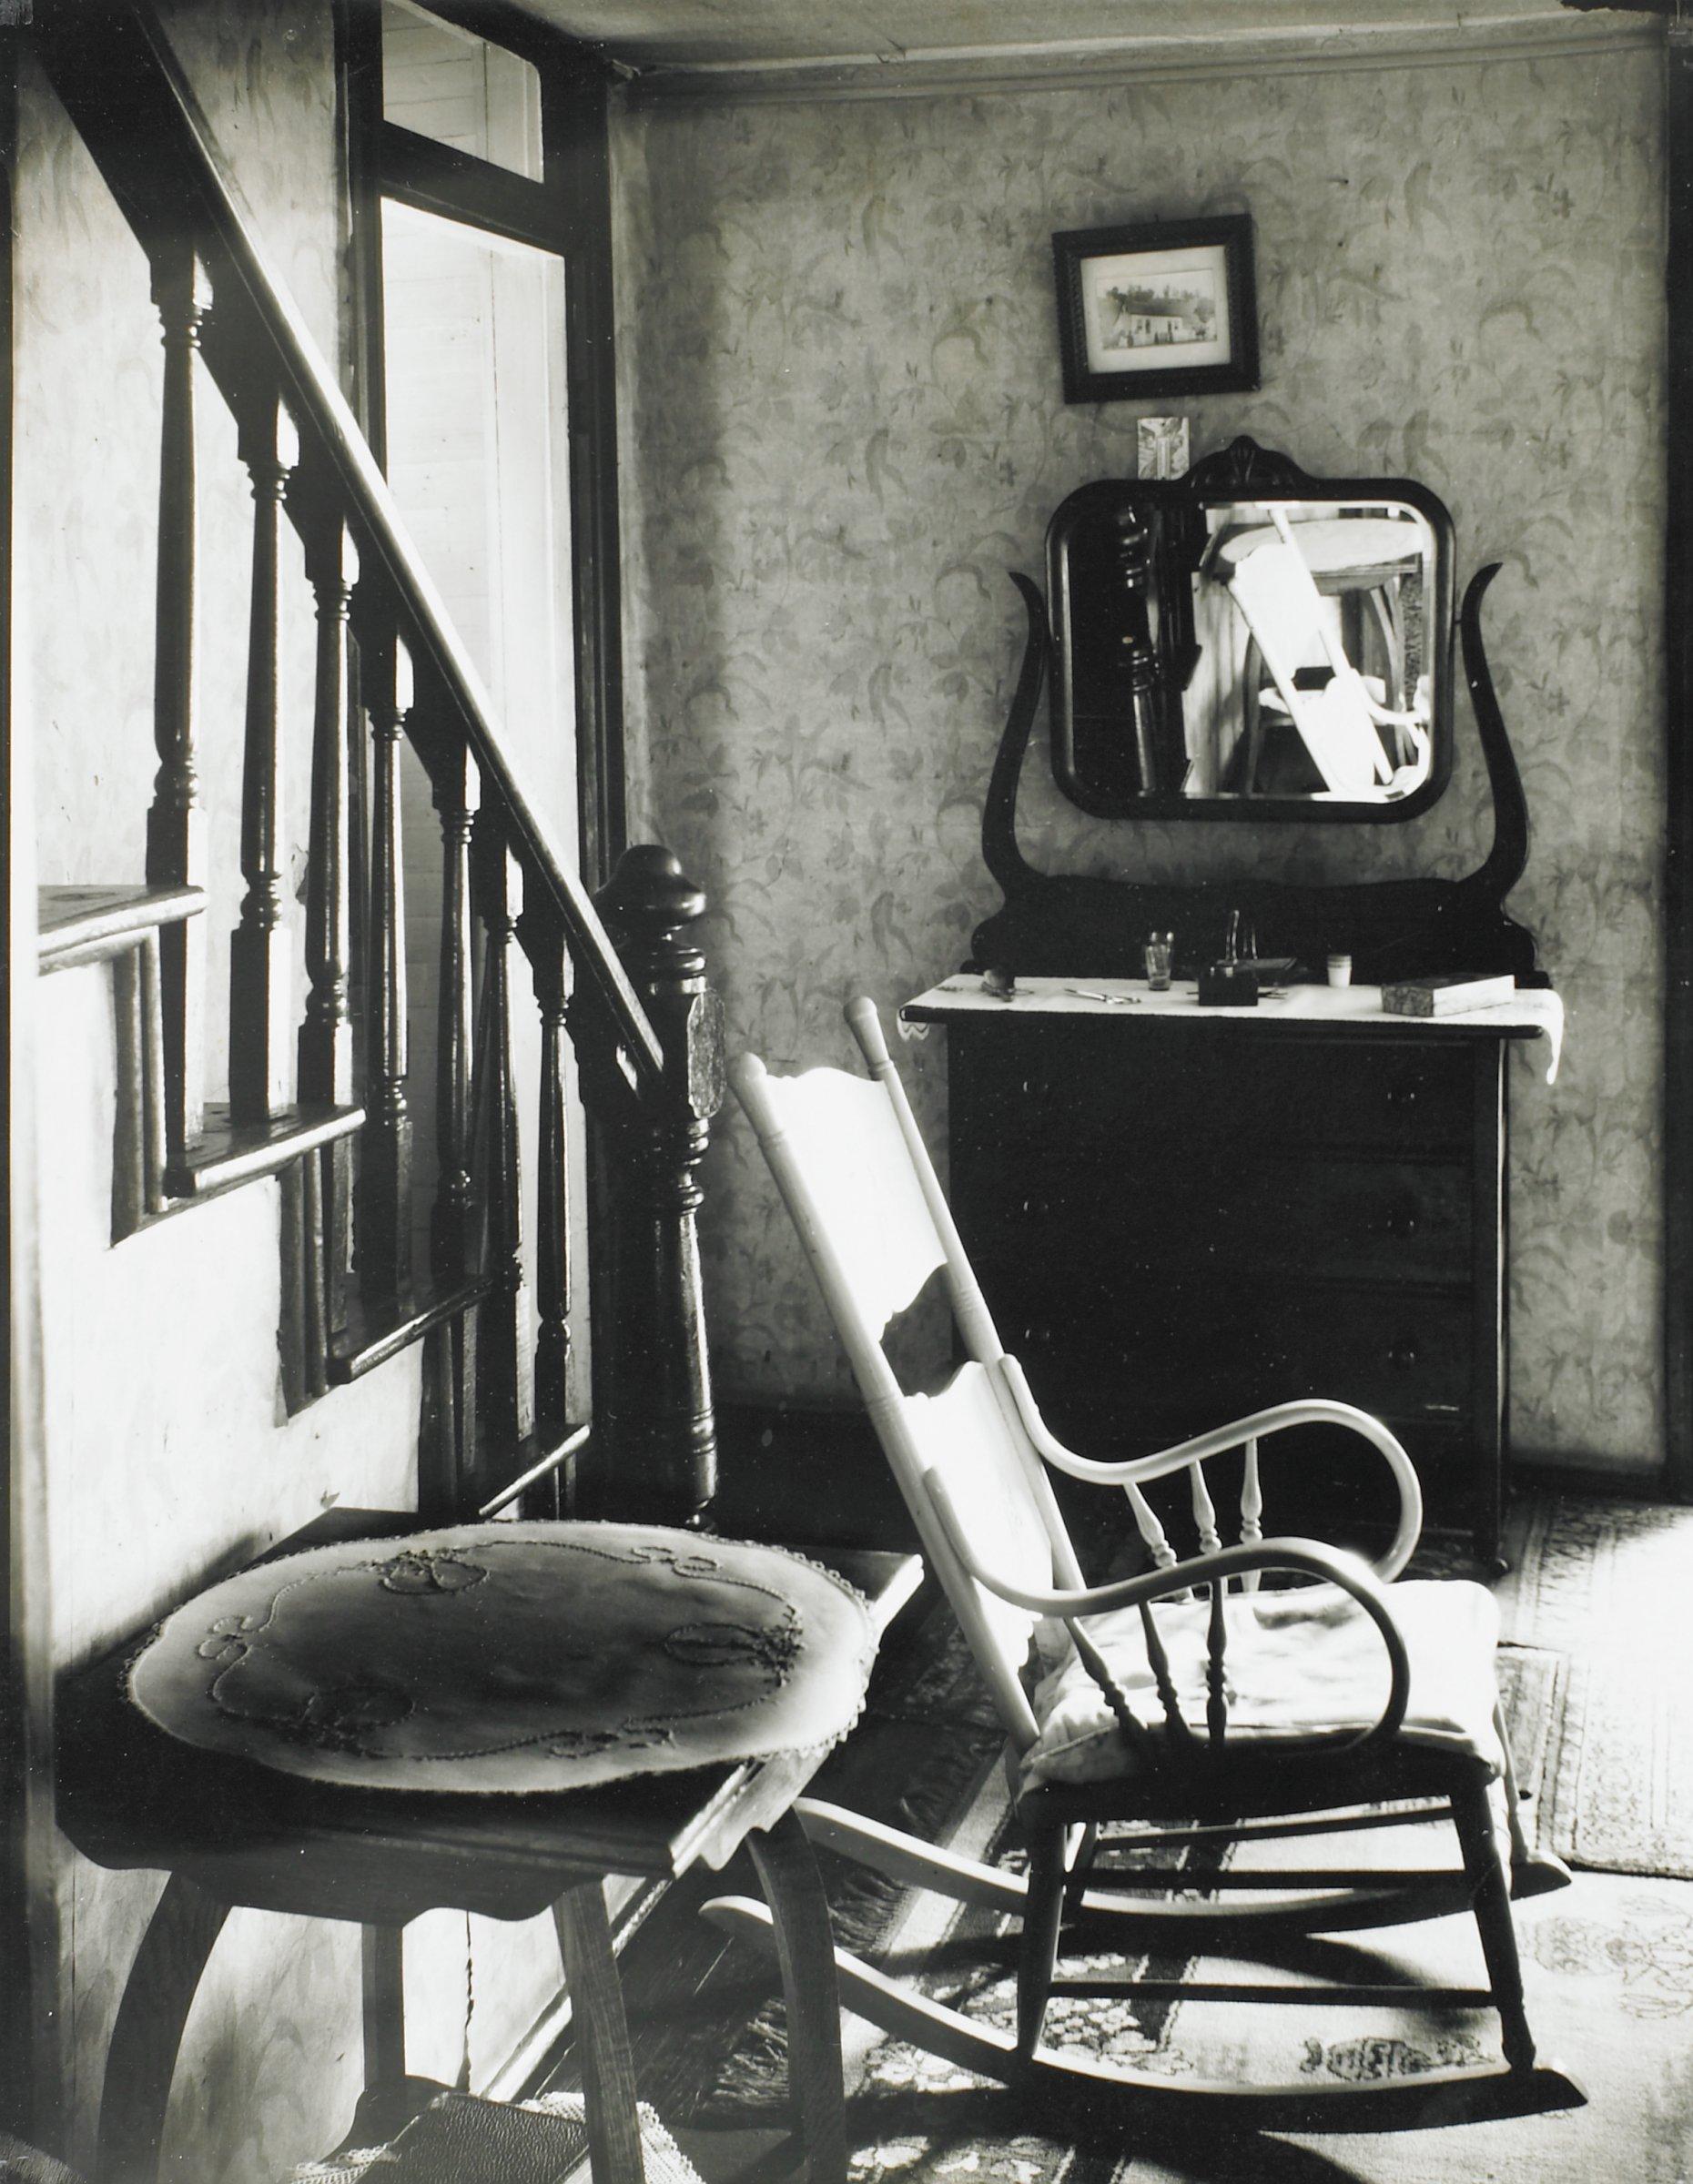 An Unemployed Worker's Home, Morgantown, West Virginia, Walker Evans, gelatin silver print